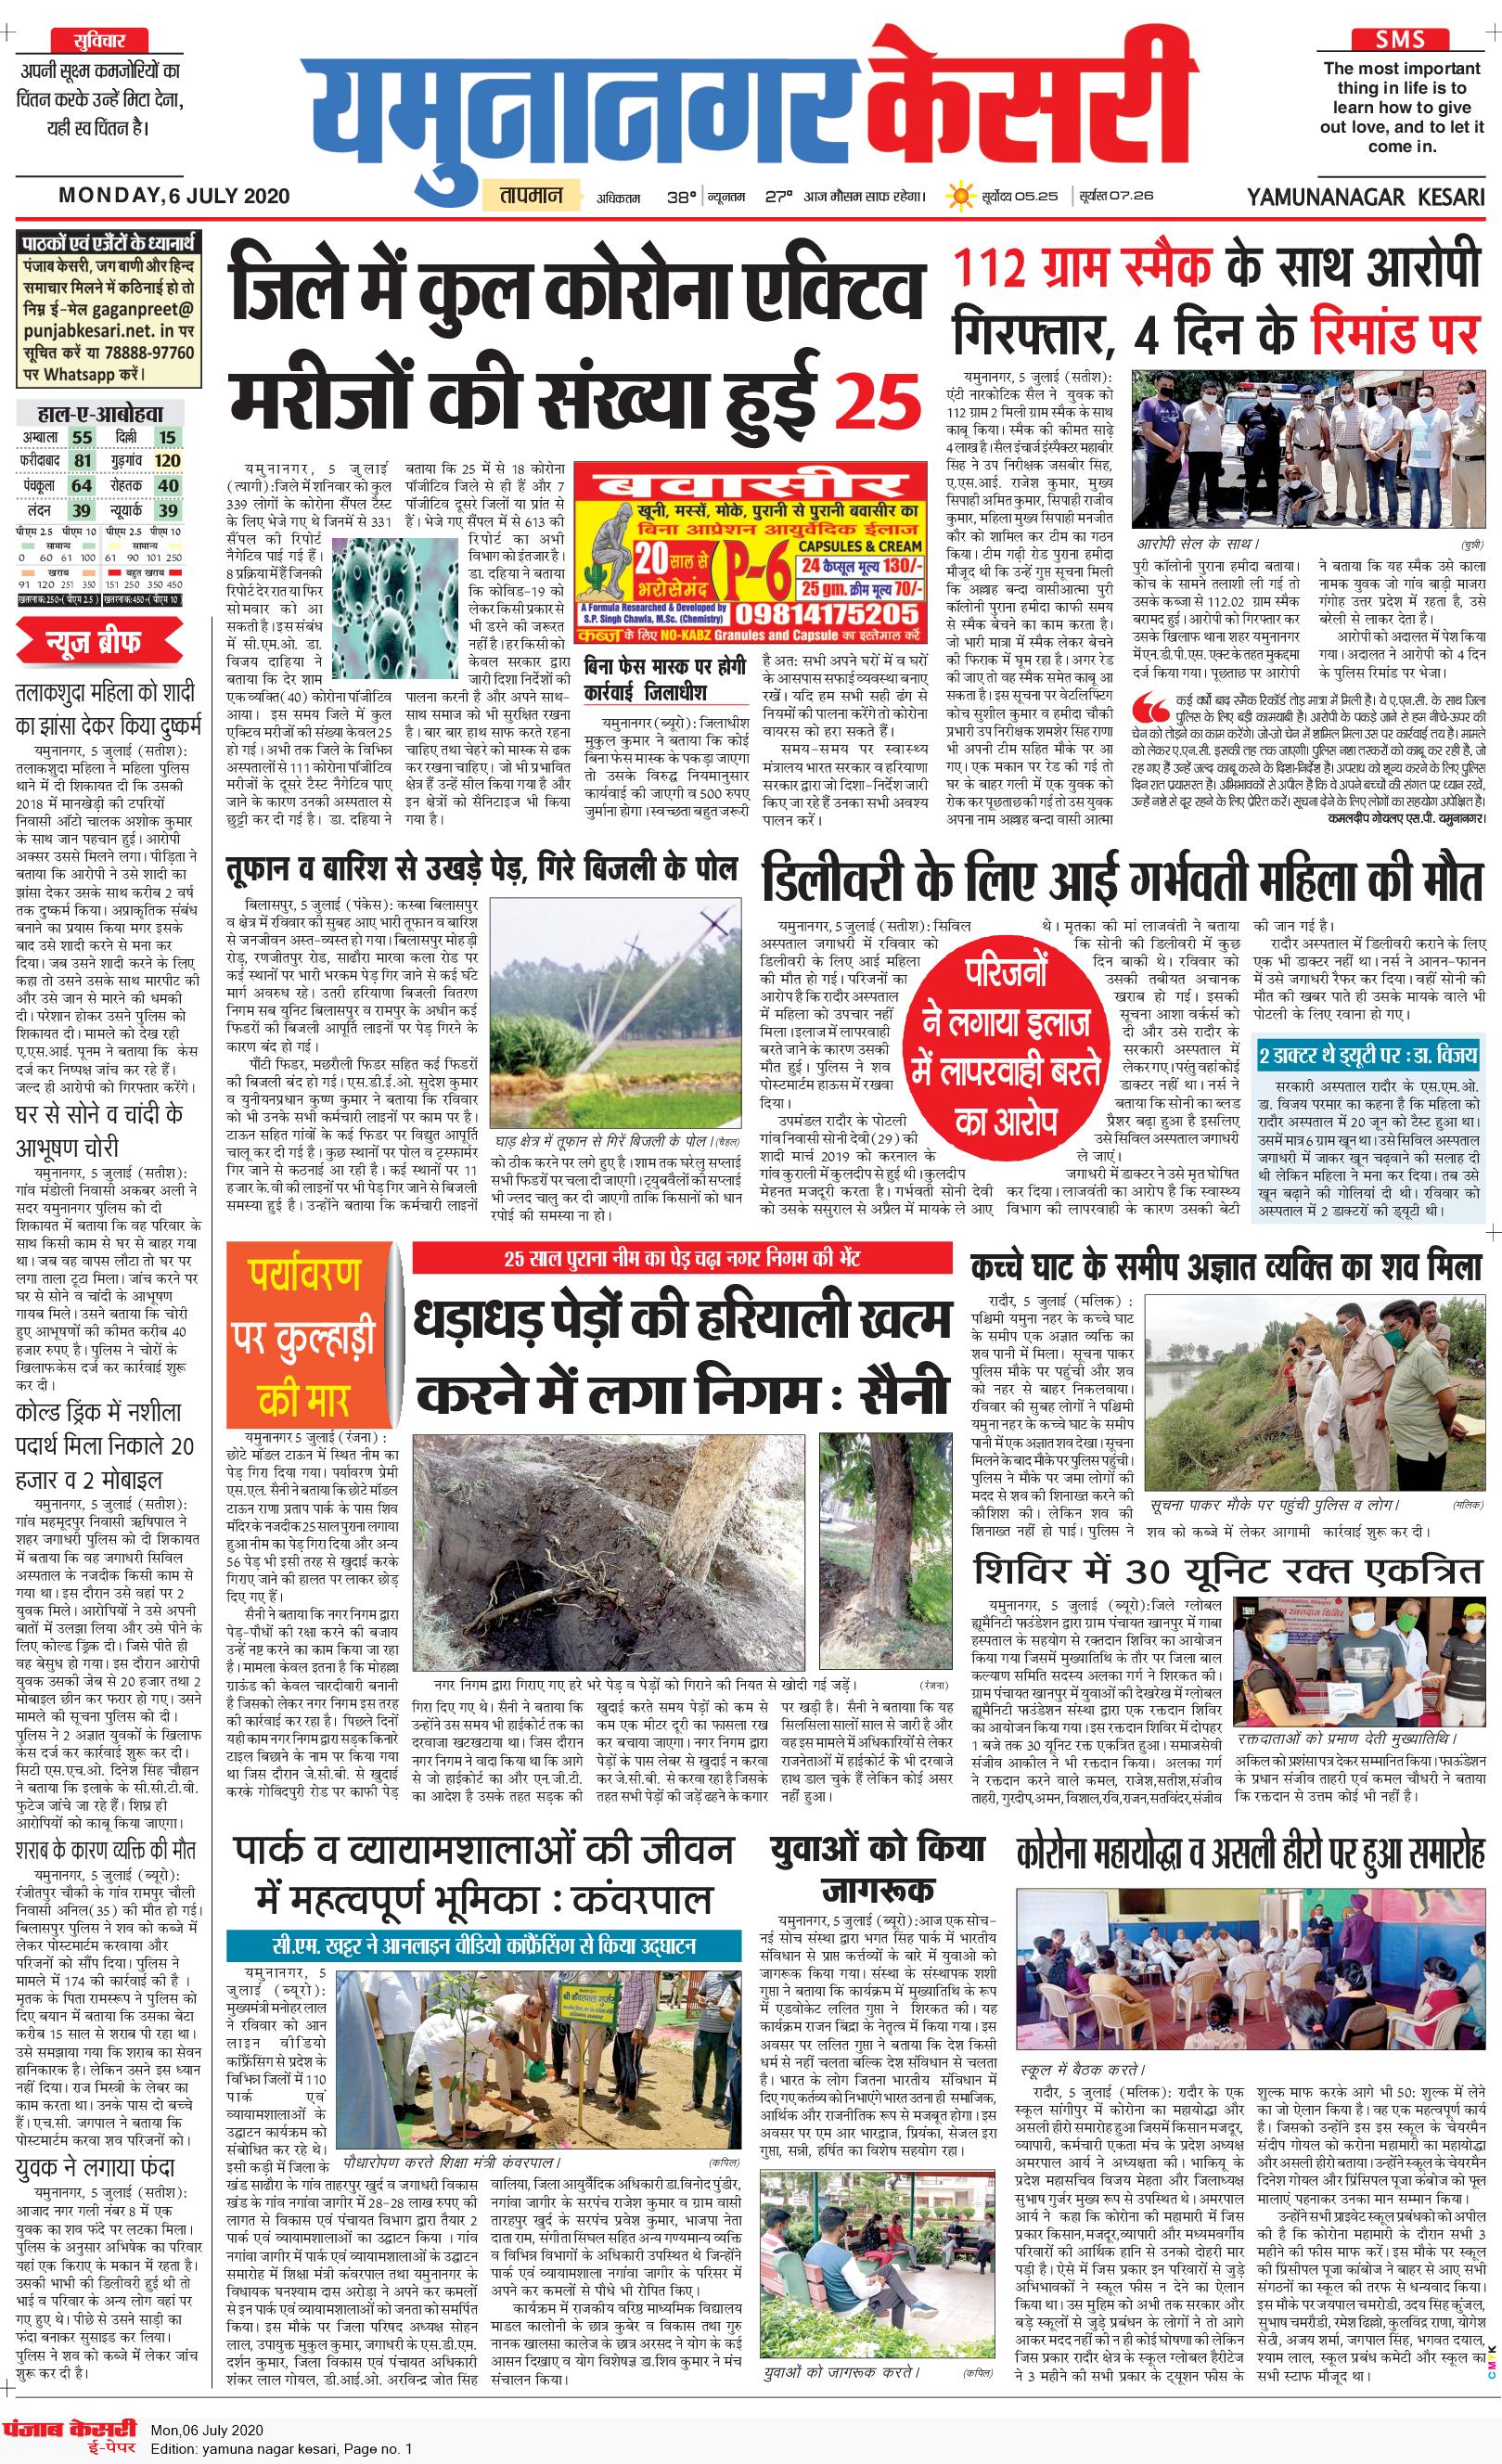 Yamuna Nagar Kesari 7/6/2020 12:00:00 AM